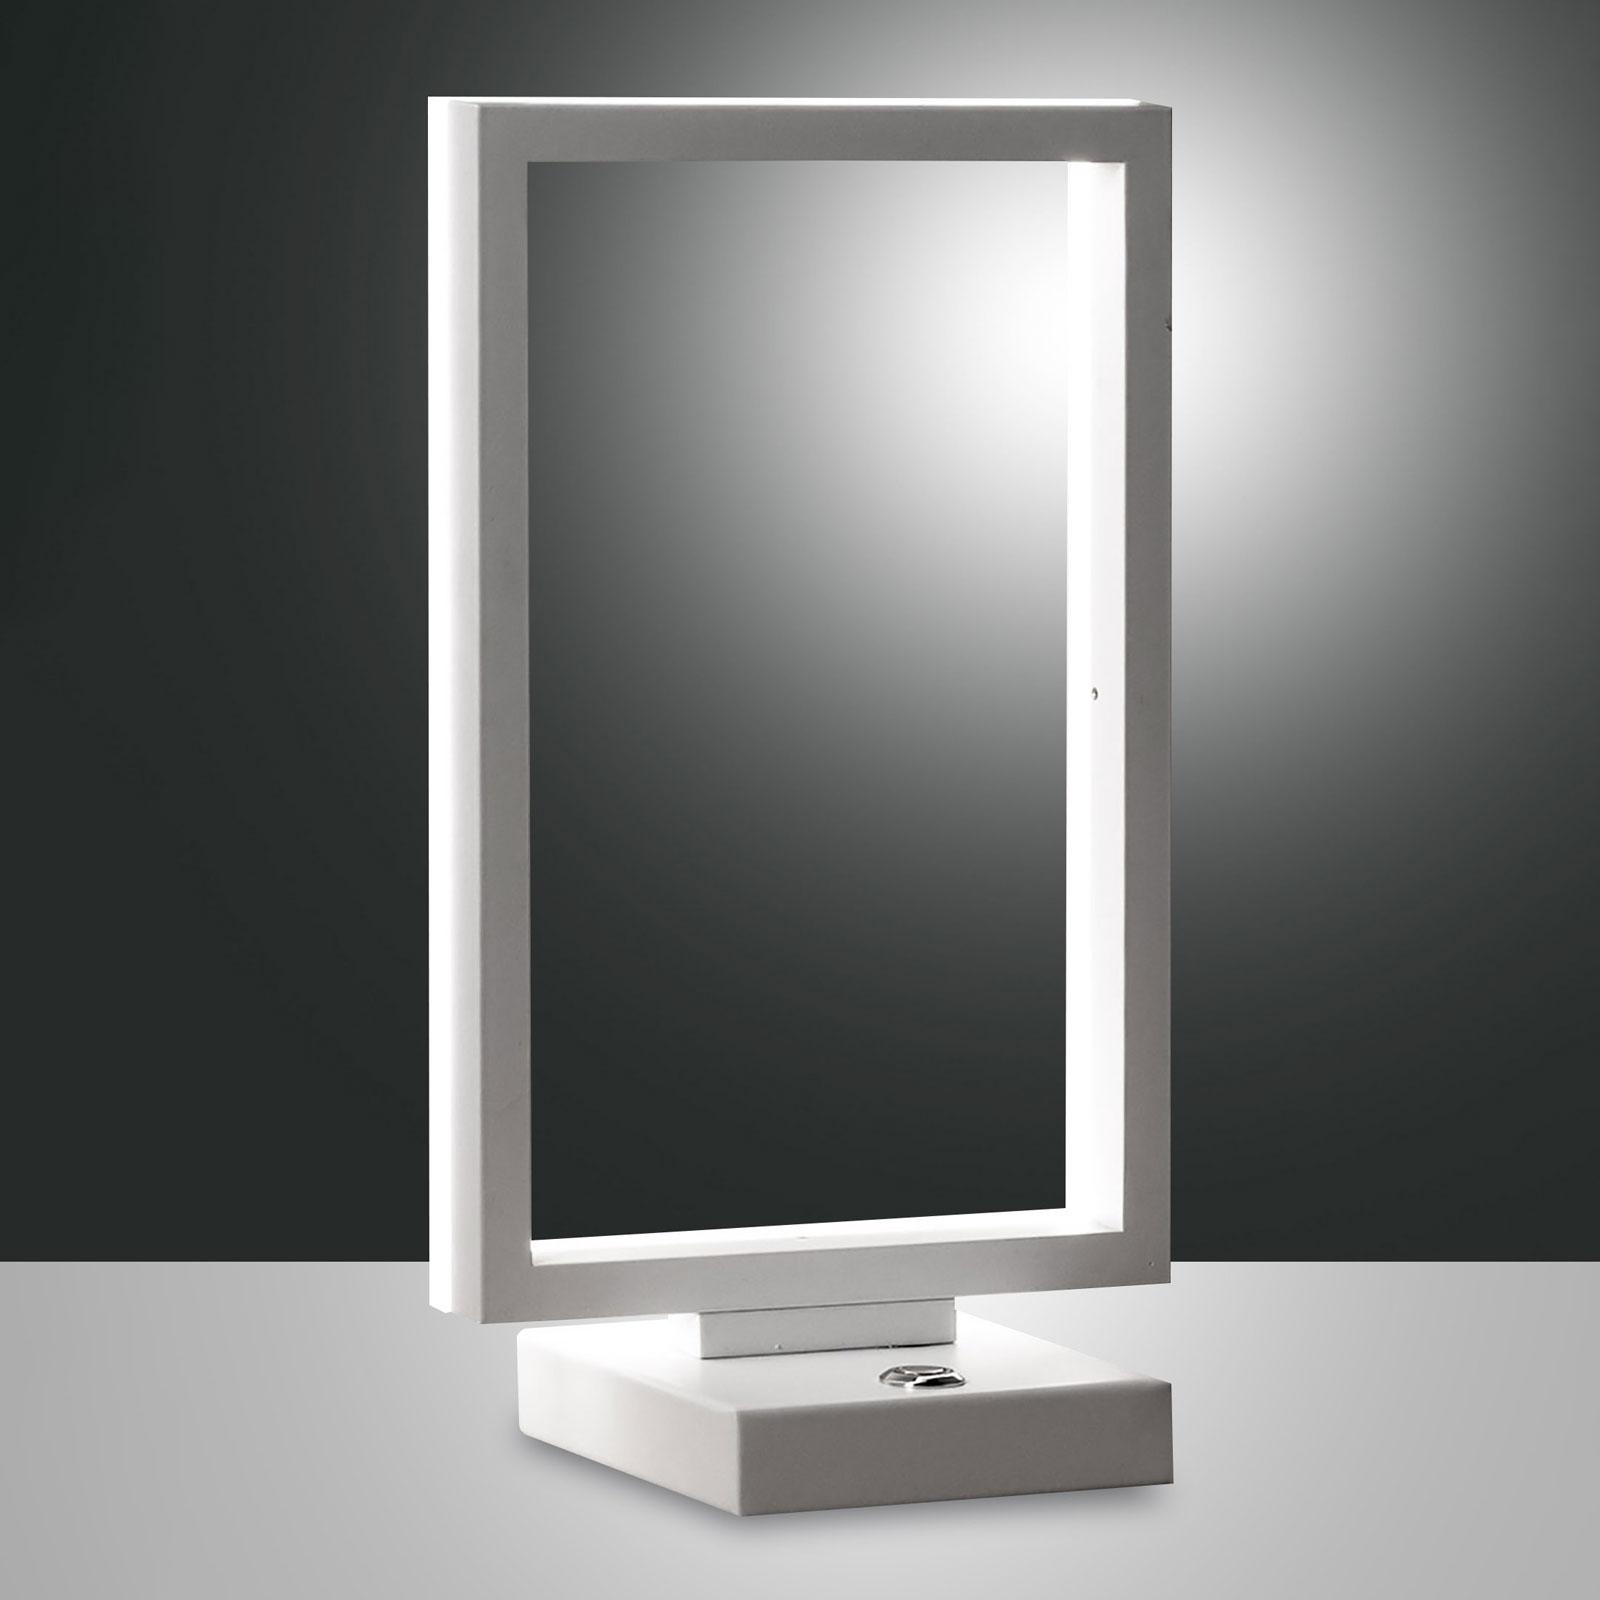 Lampe à poser LED Bard, dimmable, en blanc